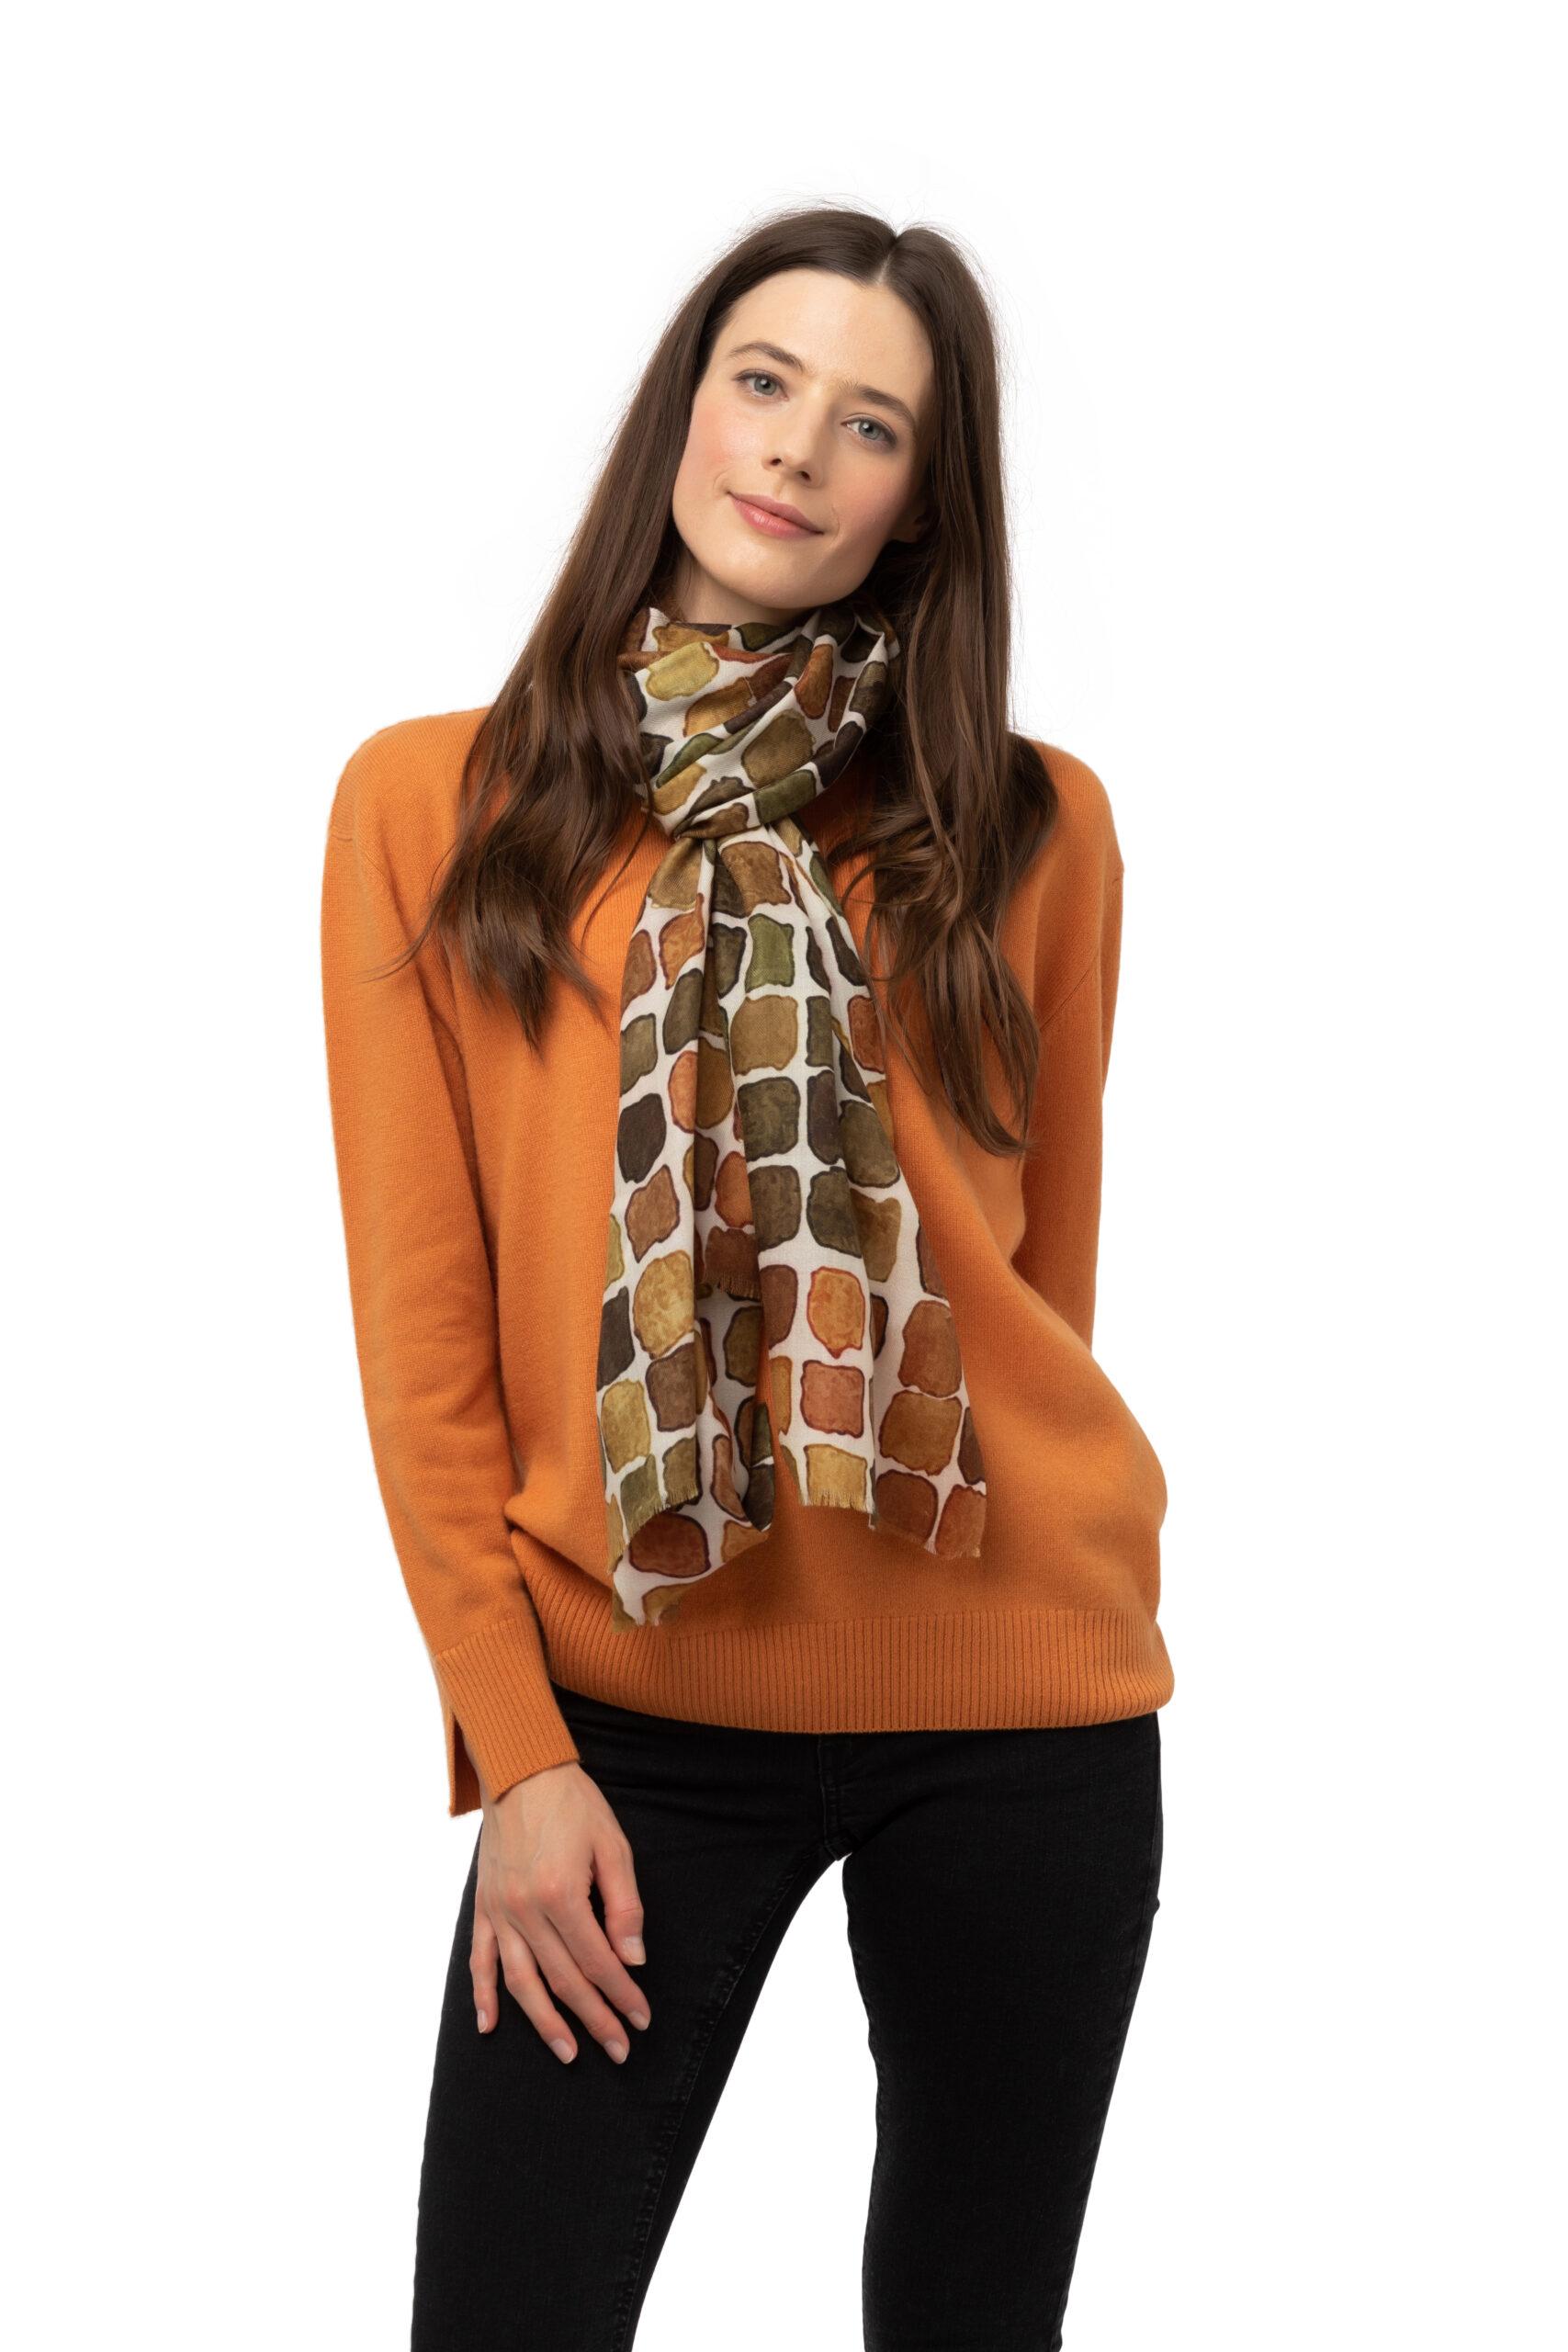 Vävd sjal - kashmirsjal av 8design Cashmere brun